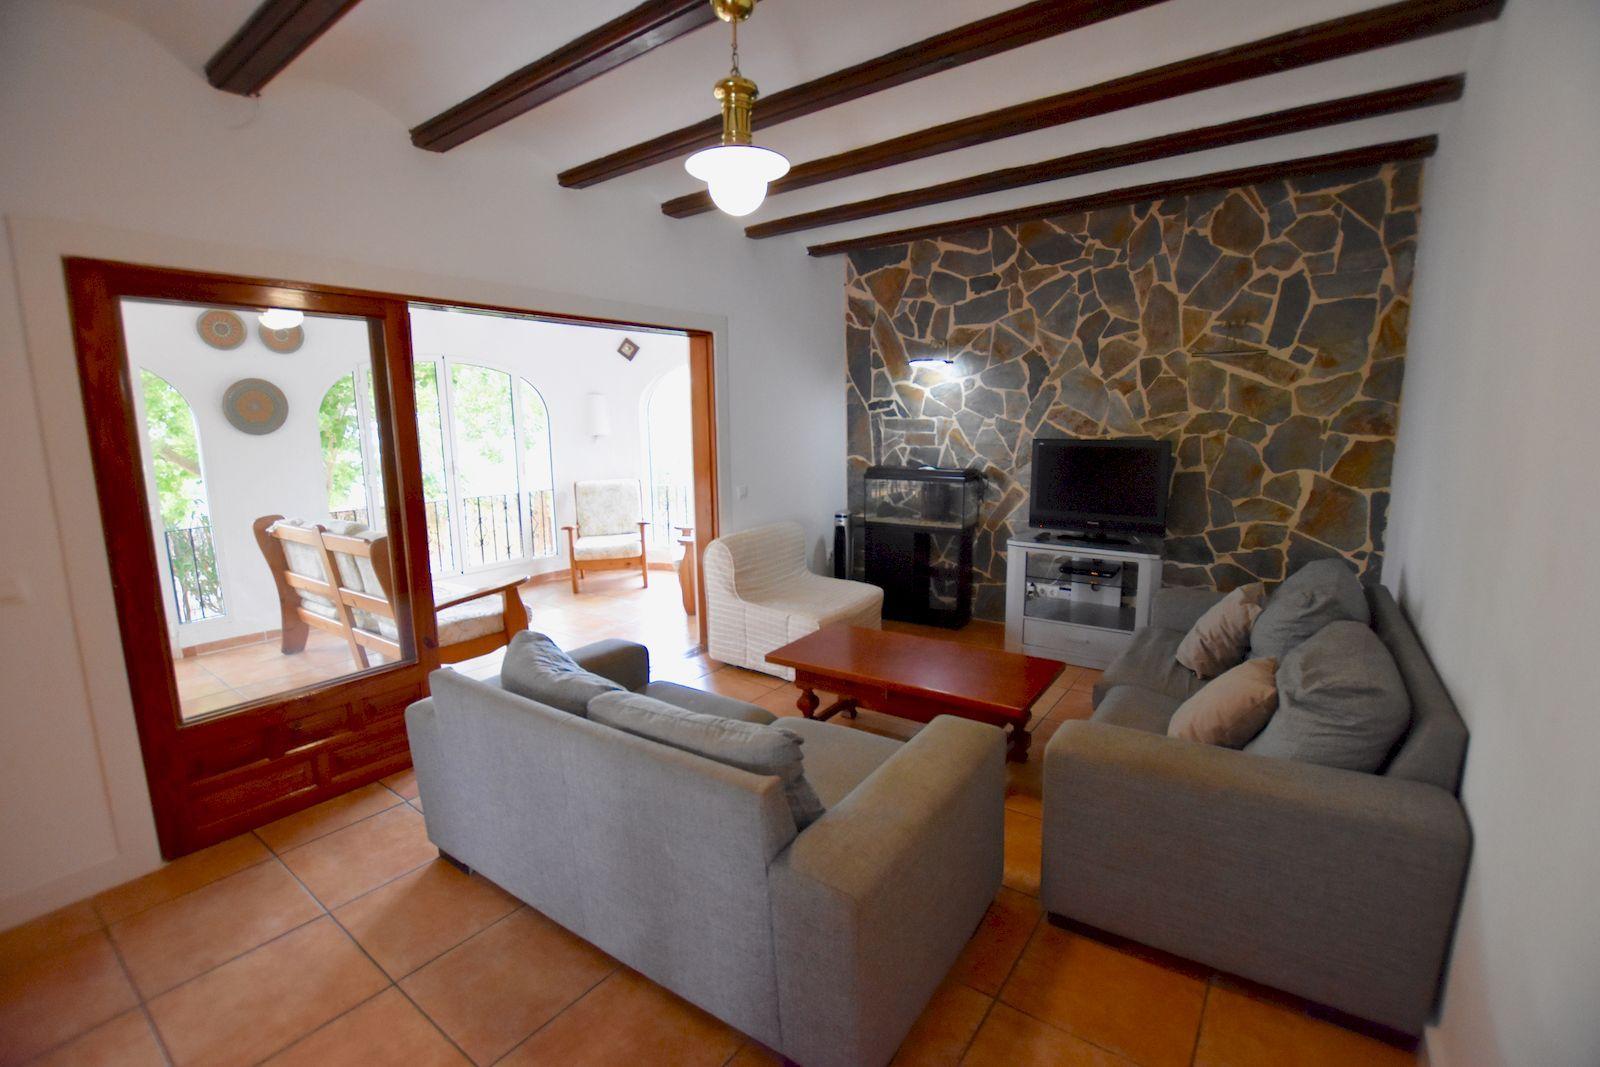 Villa Toscal - Javea - Marina Alta - Costa Blanca - Alicante